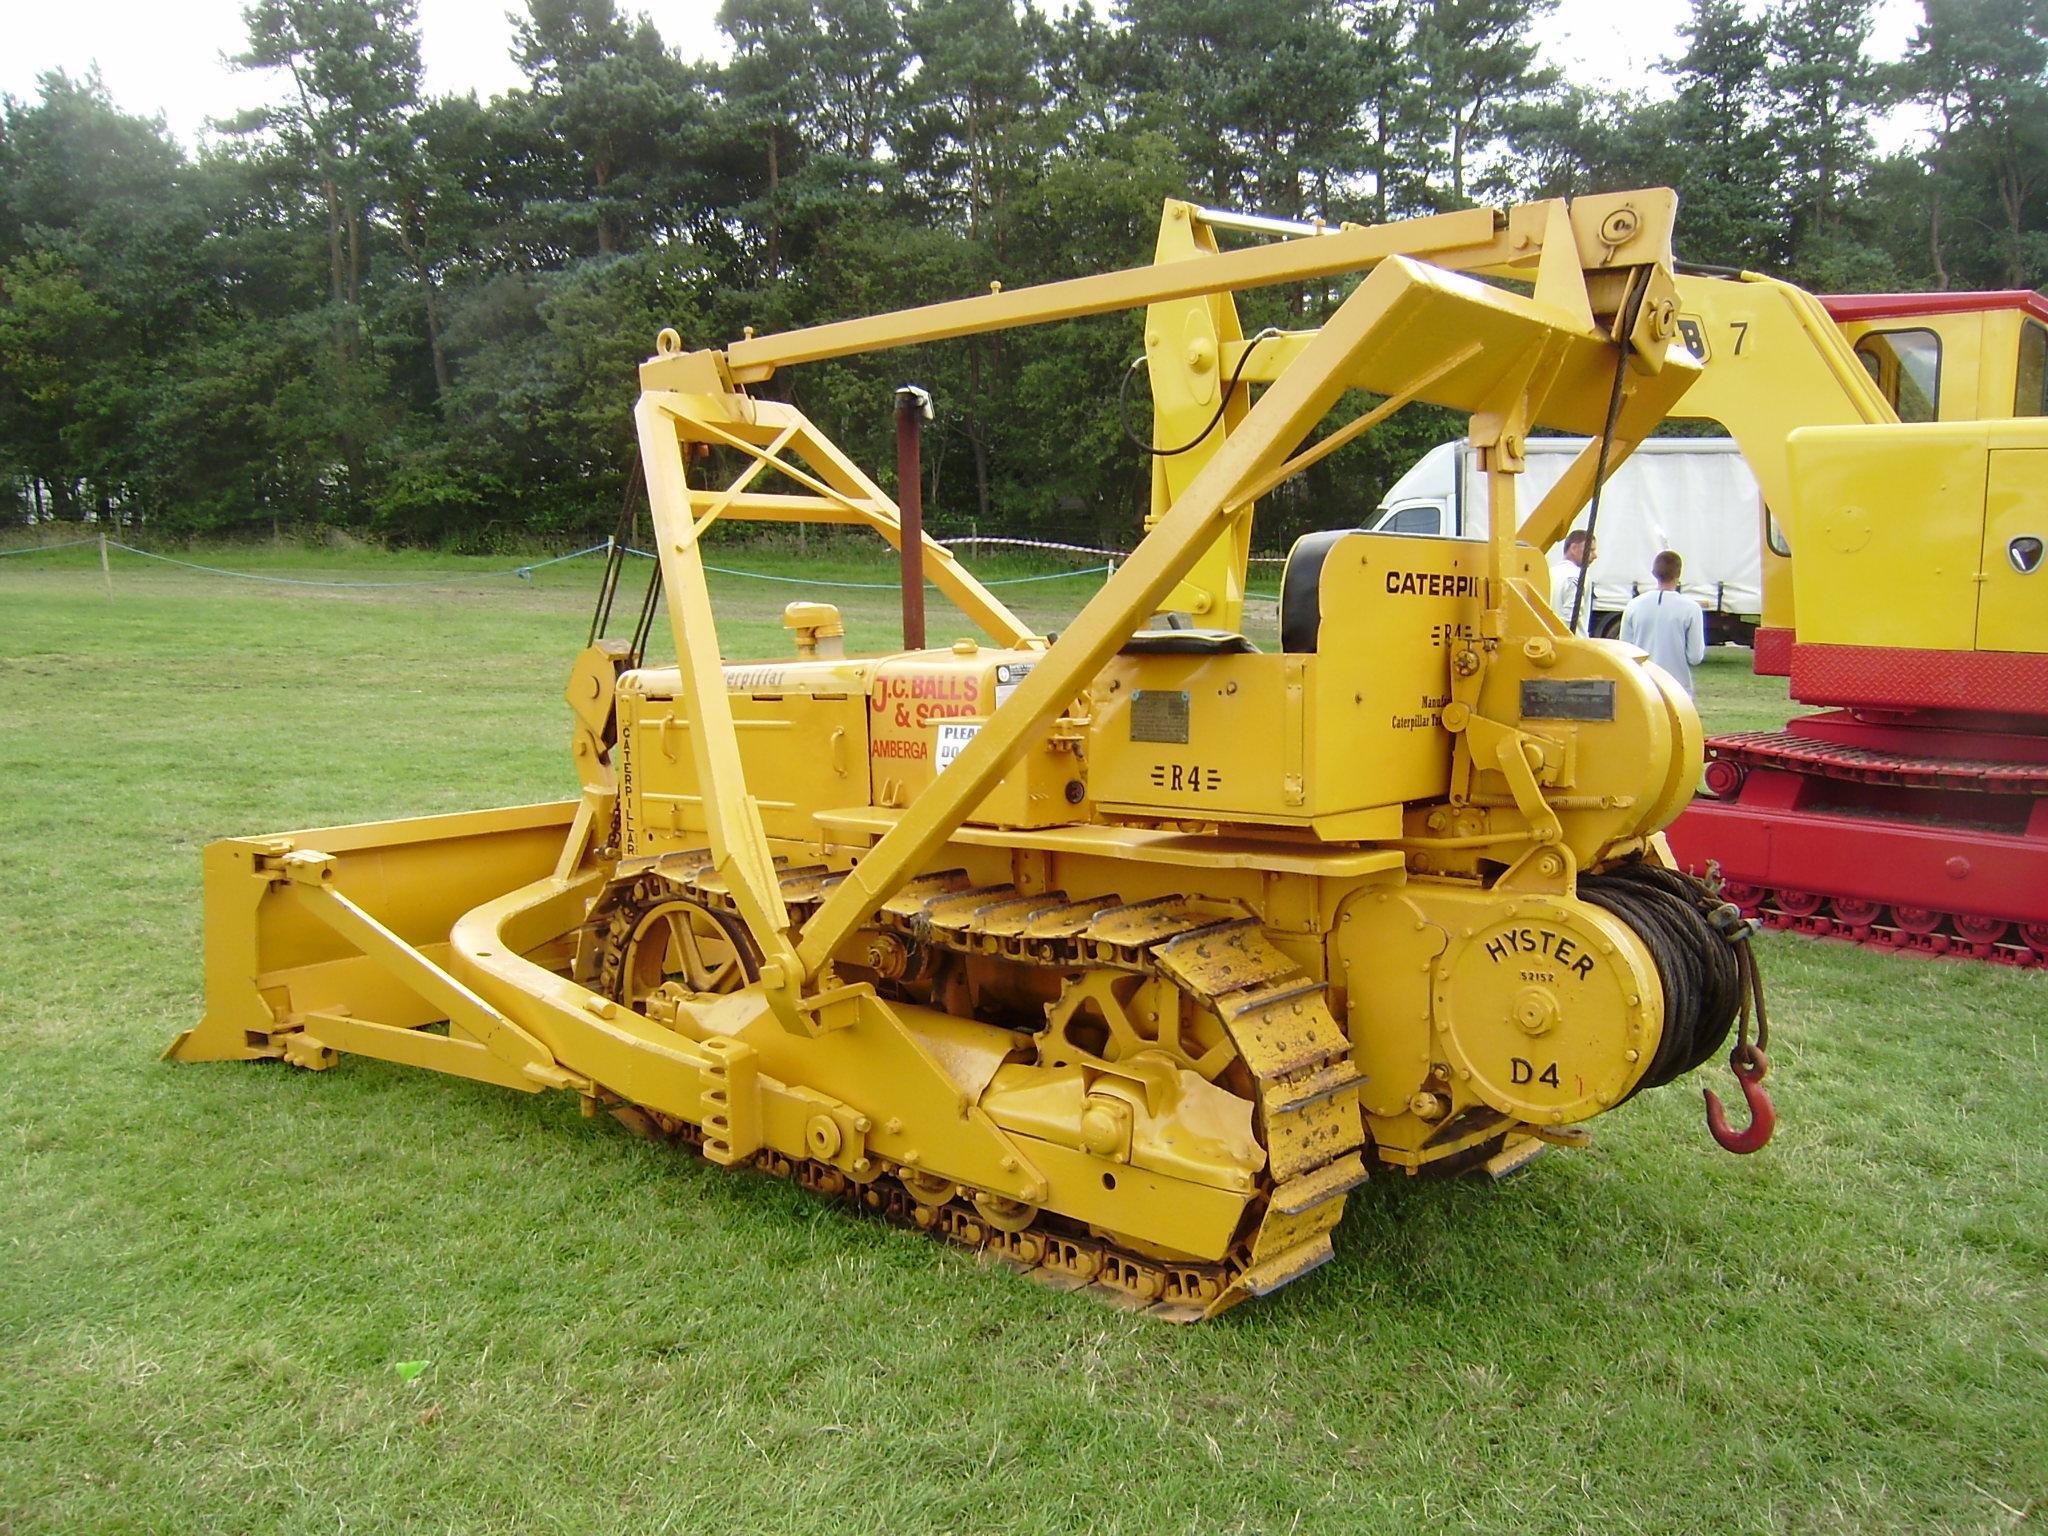 Old Caterpillar Tractors